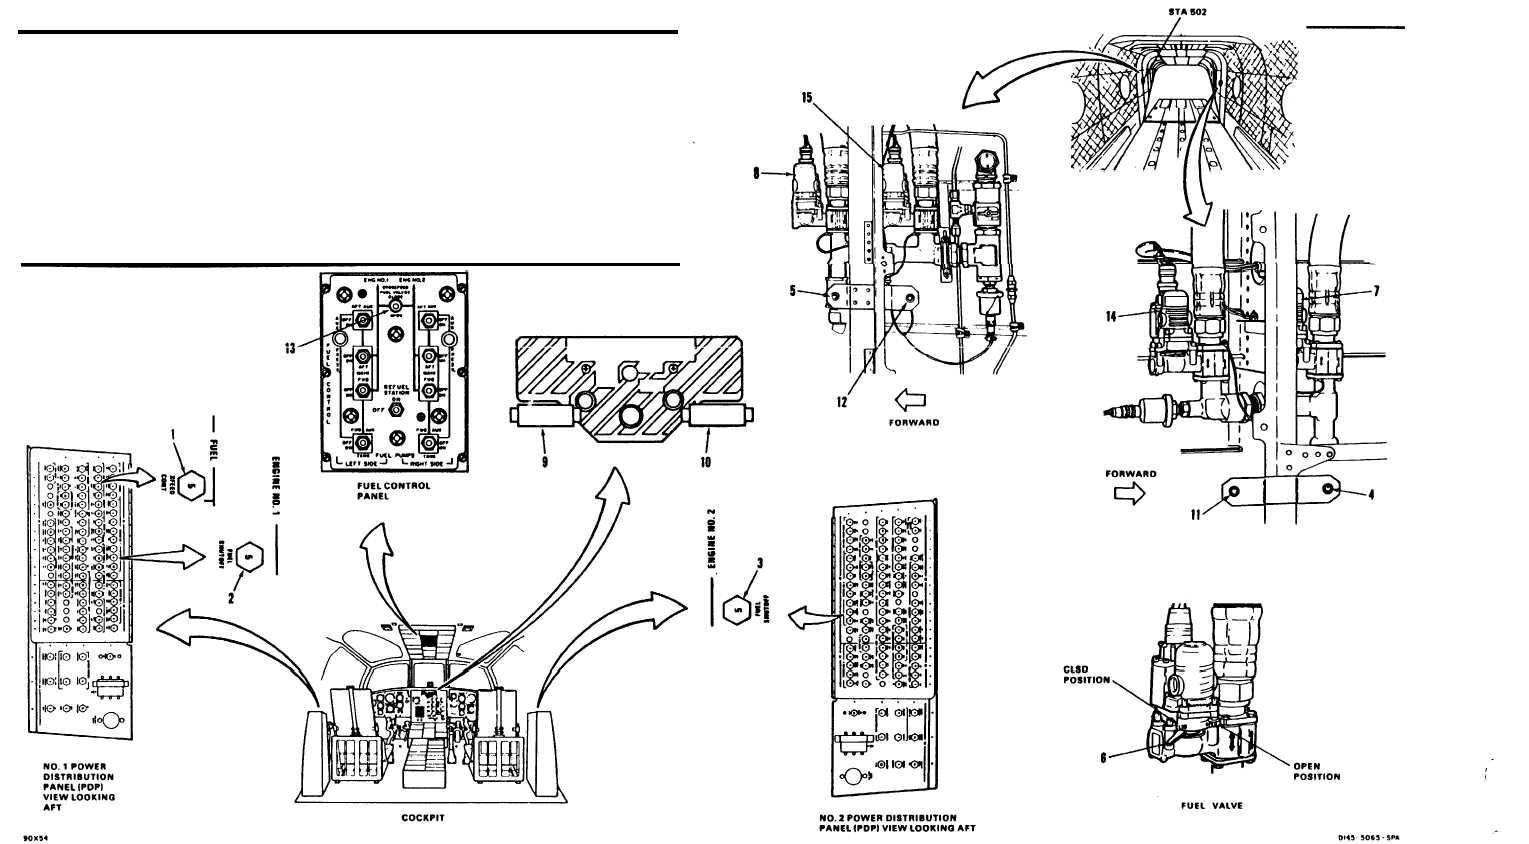 Engine Fuel Shutoff And Crossfeed Valves Operational Chec